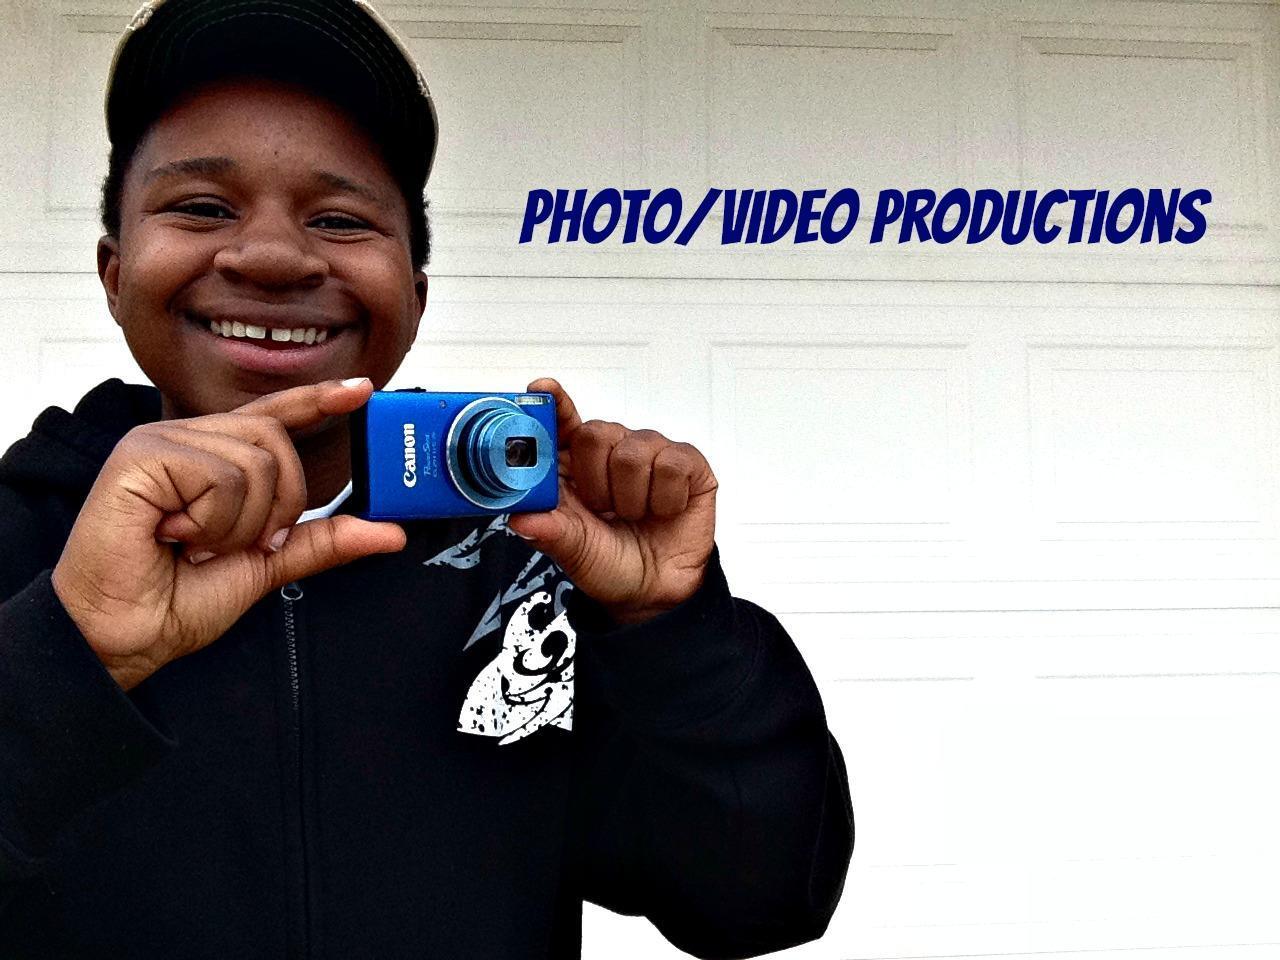 Kars Scott Photo/Video Productions image 0